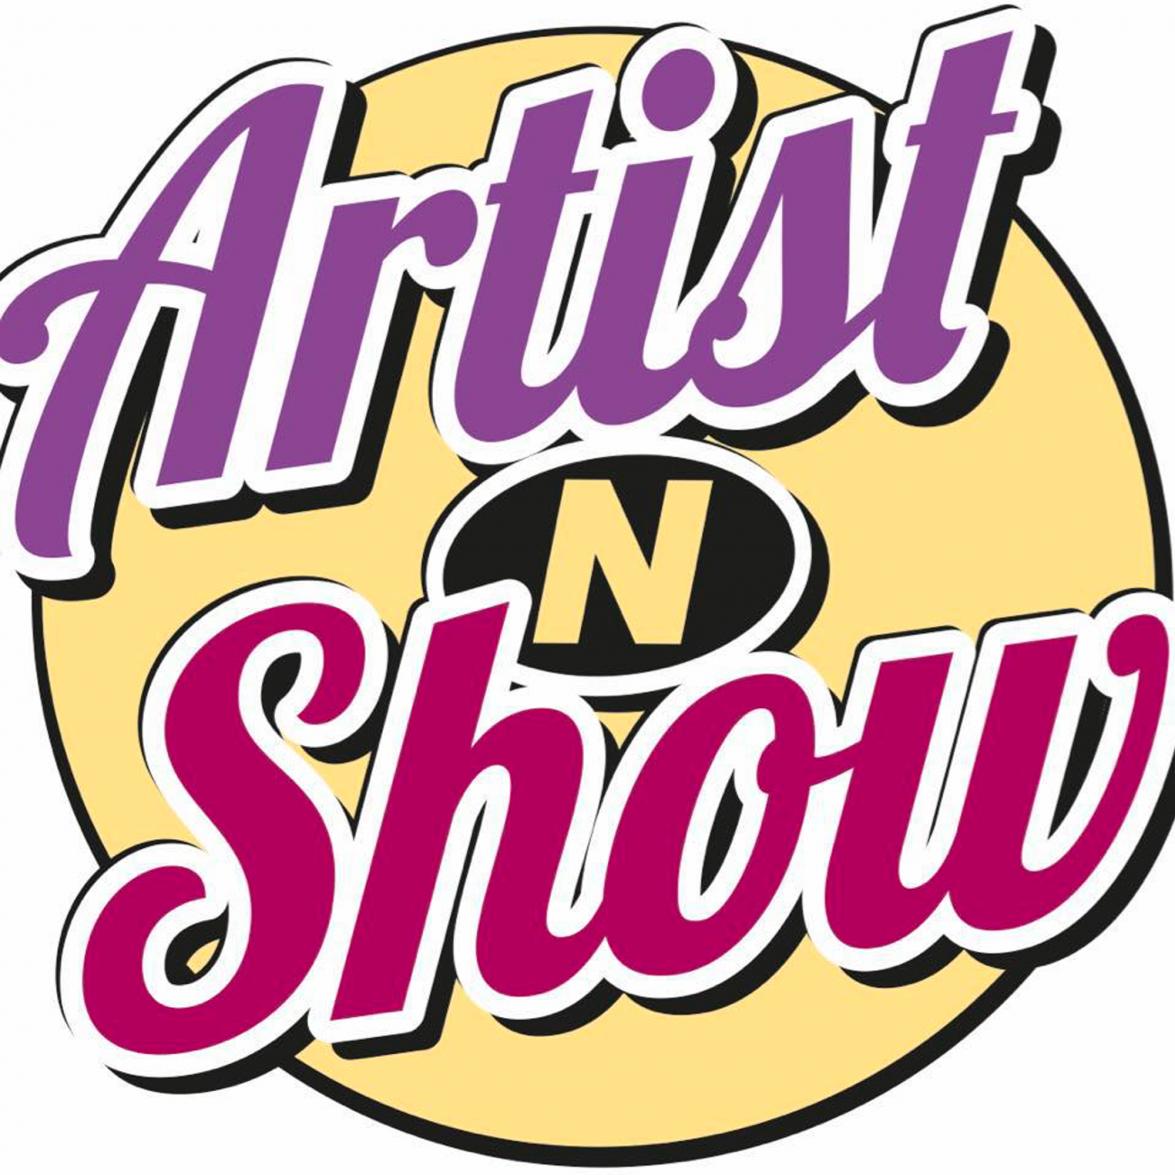 Angèle Von kiss - Mes clients - Artist'N Show